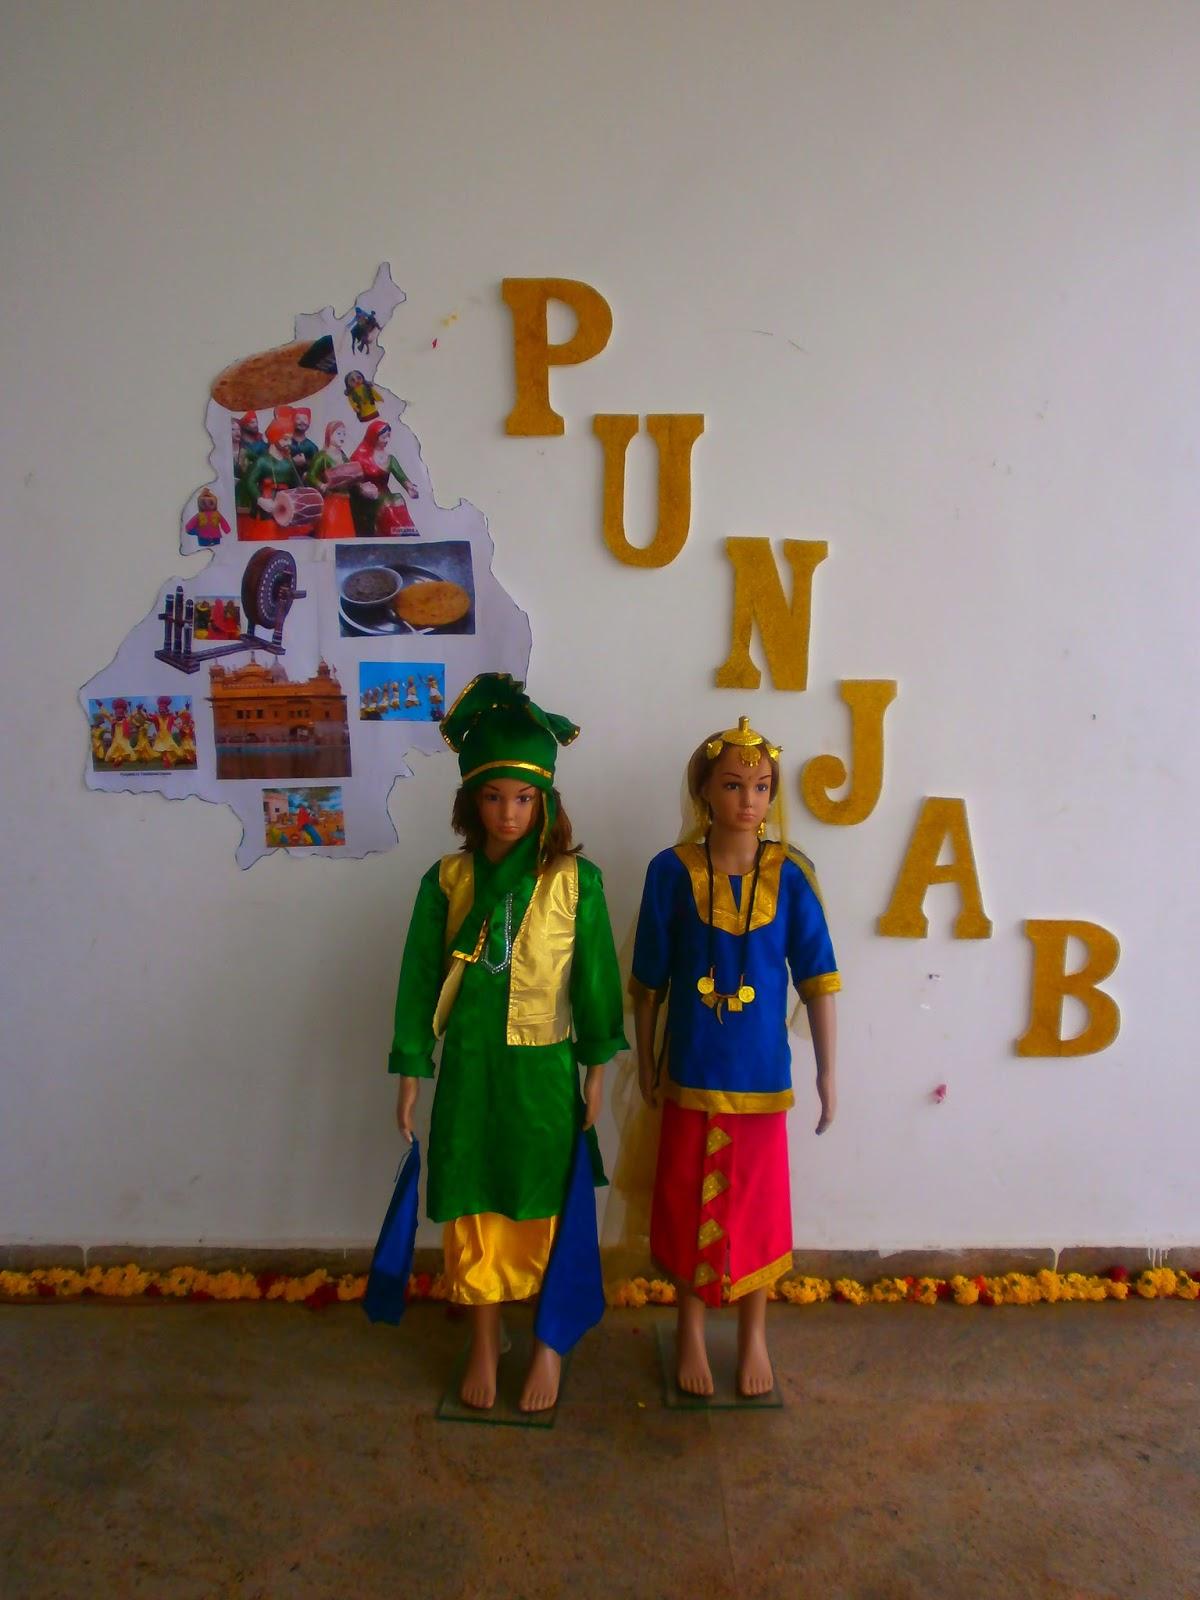 Beautiful Punjab themed decorations for Lohri Beautiful Craft ideas for Lohri Festival